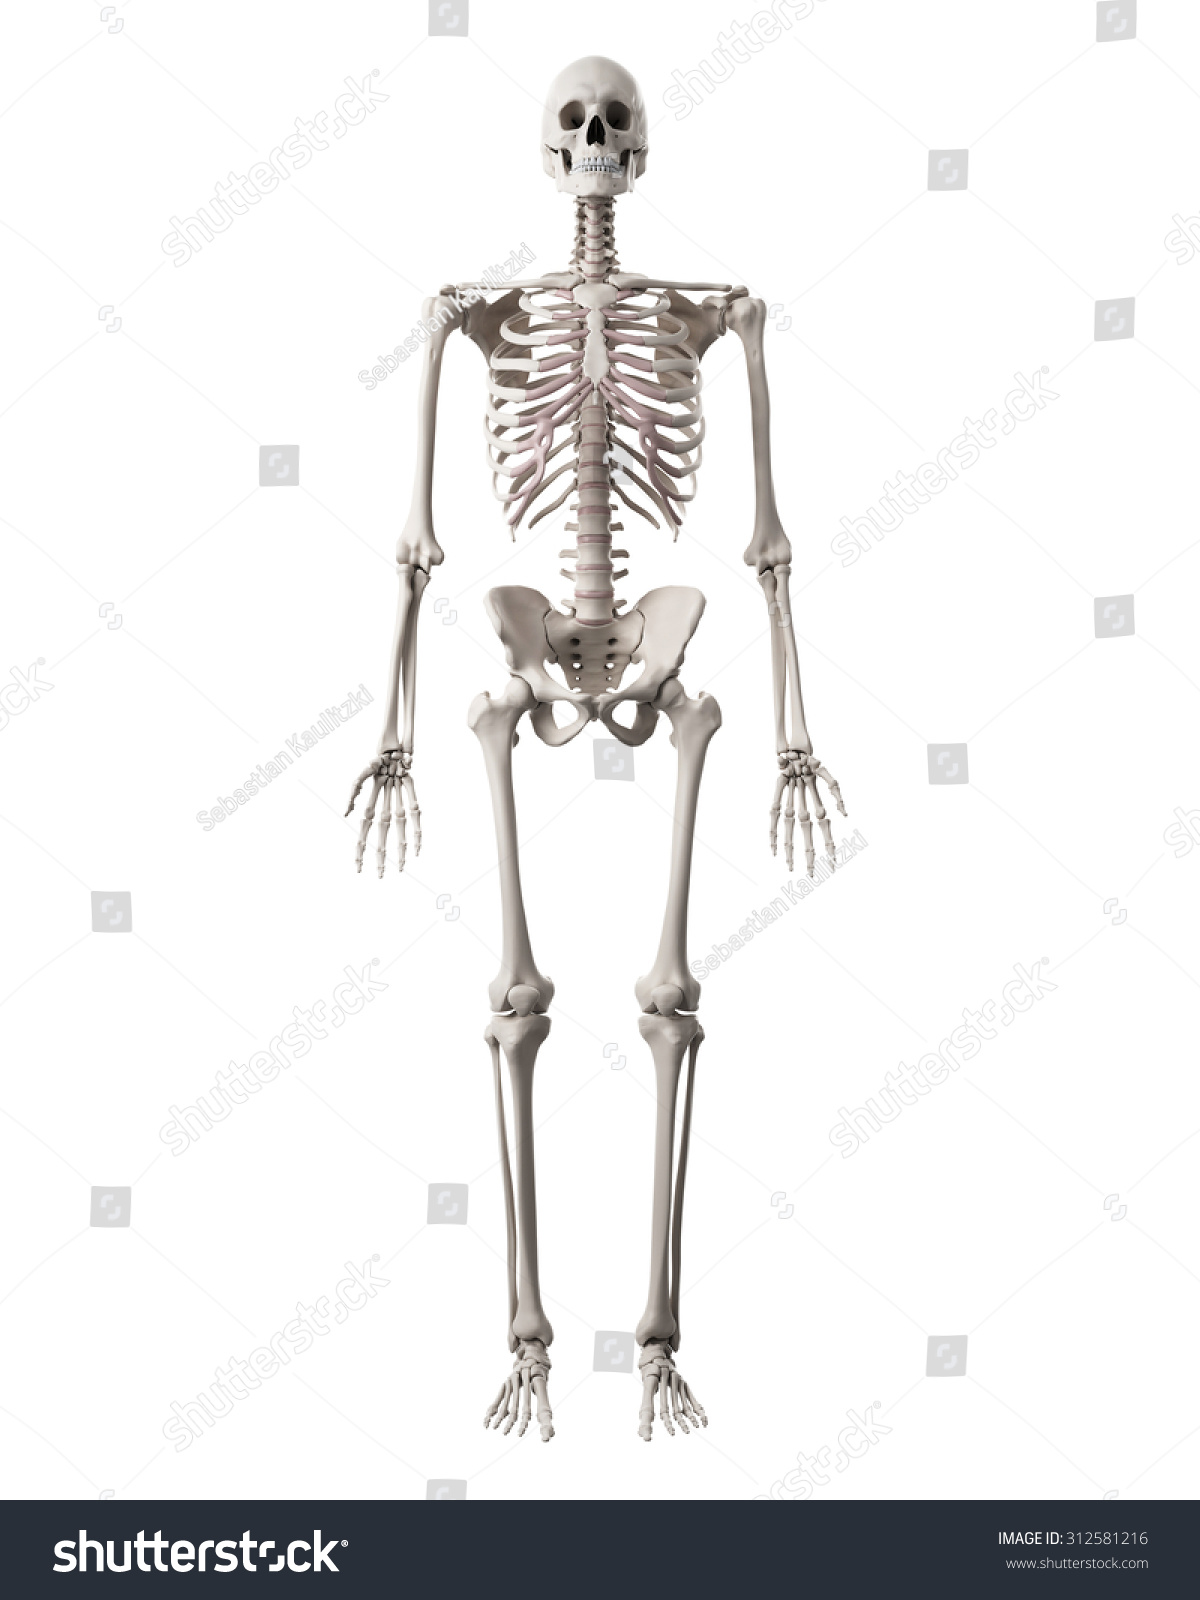 Medically Accurate Illustration Human Skeleton Stockillustration